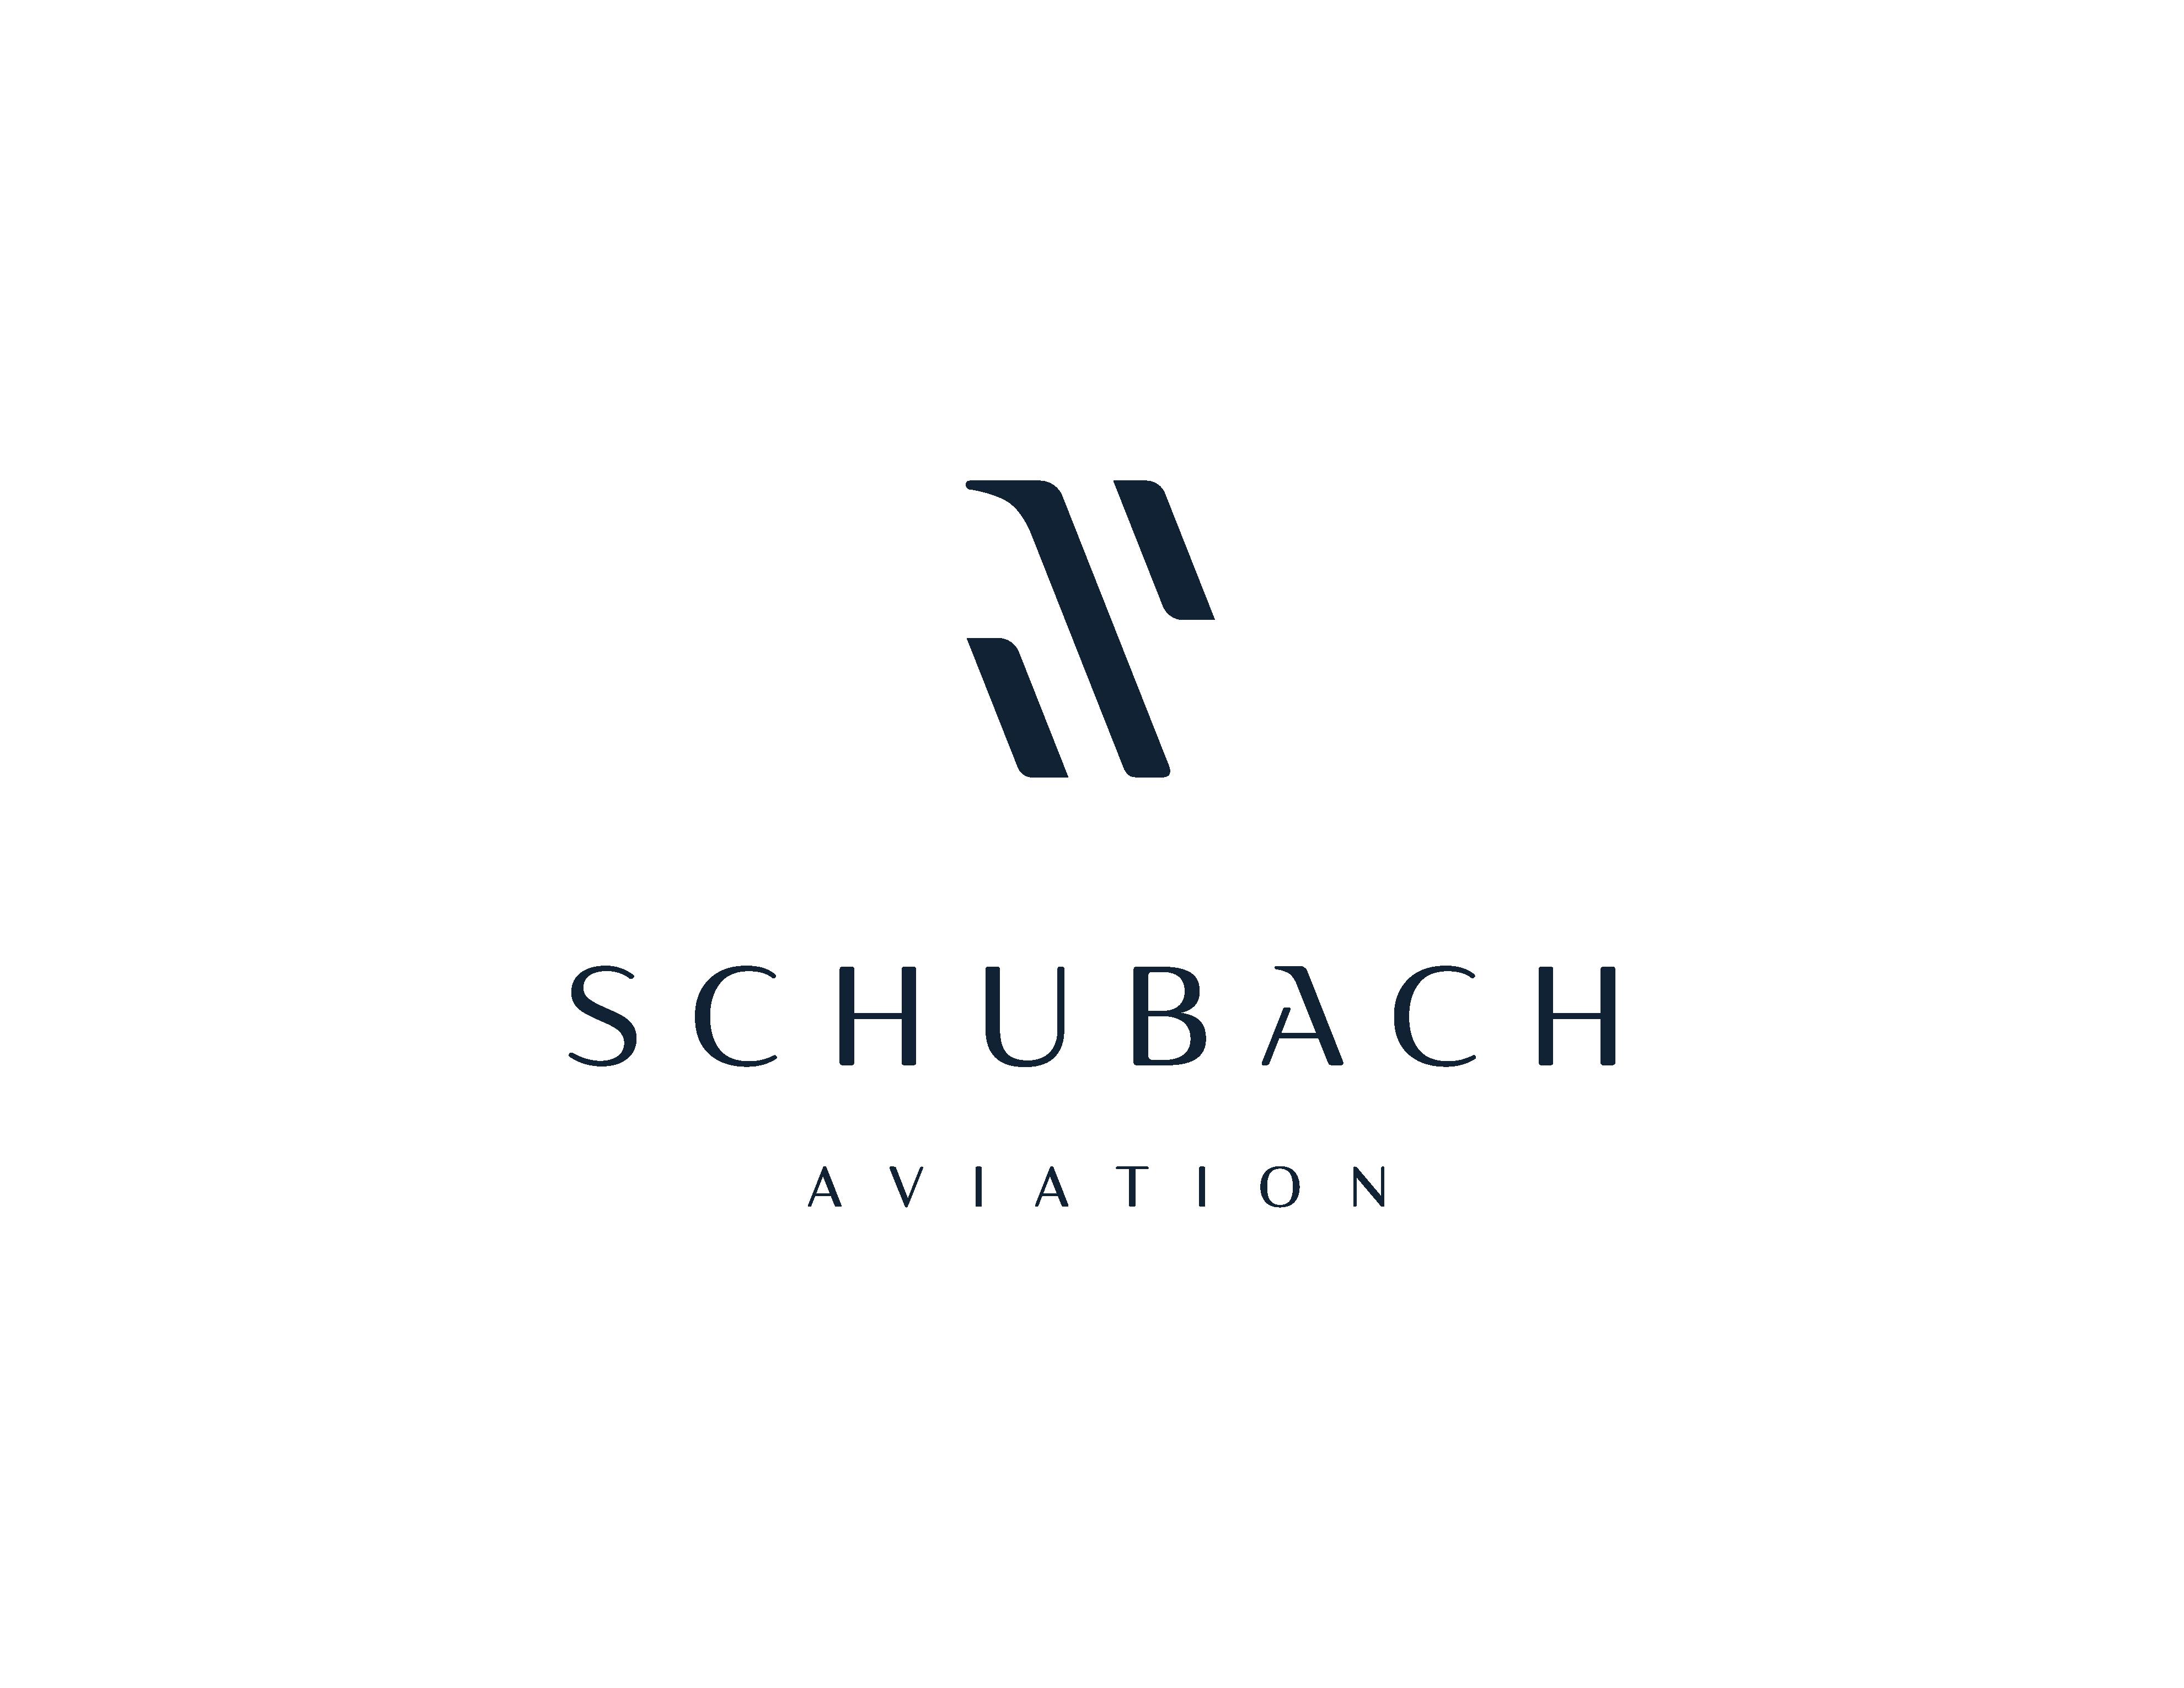 Schubach Aviation